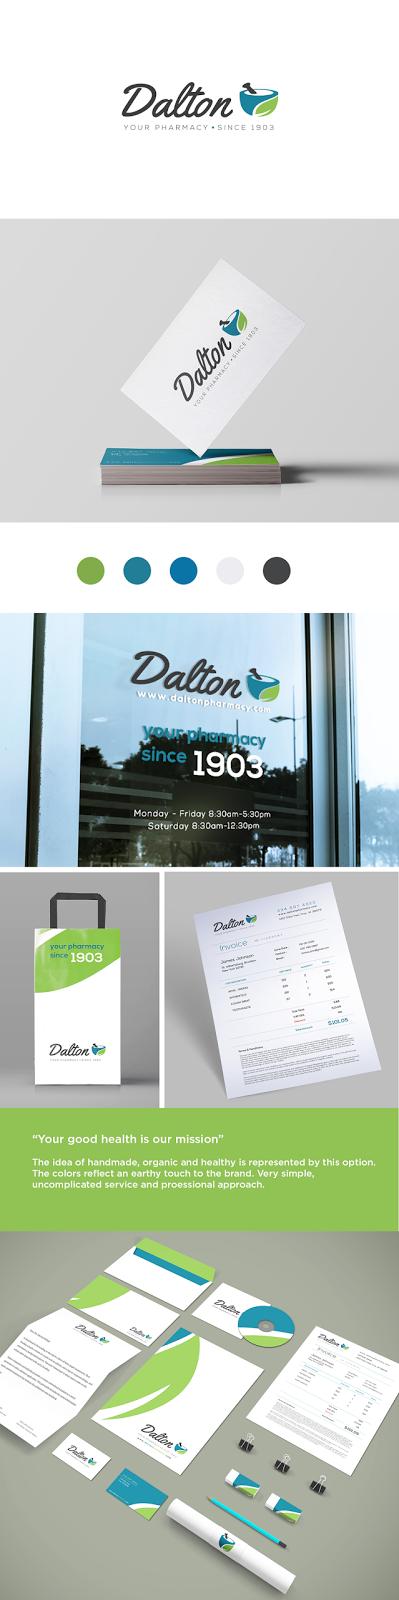 Dalton Pharmacy Branding